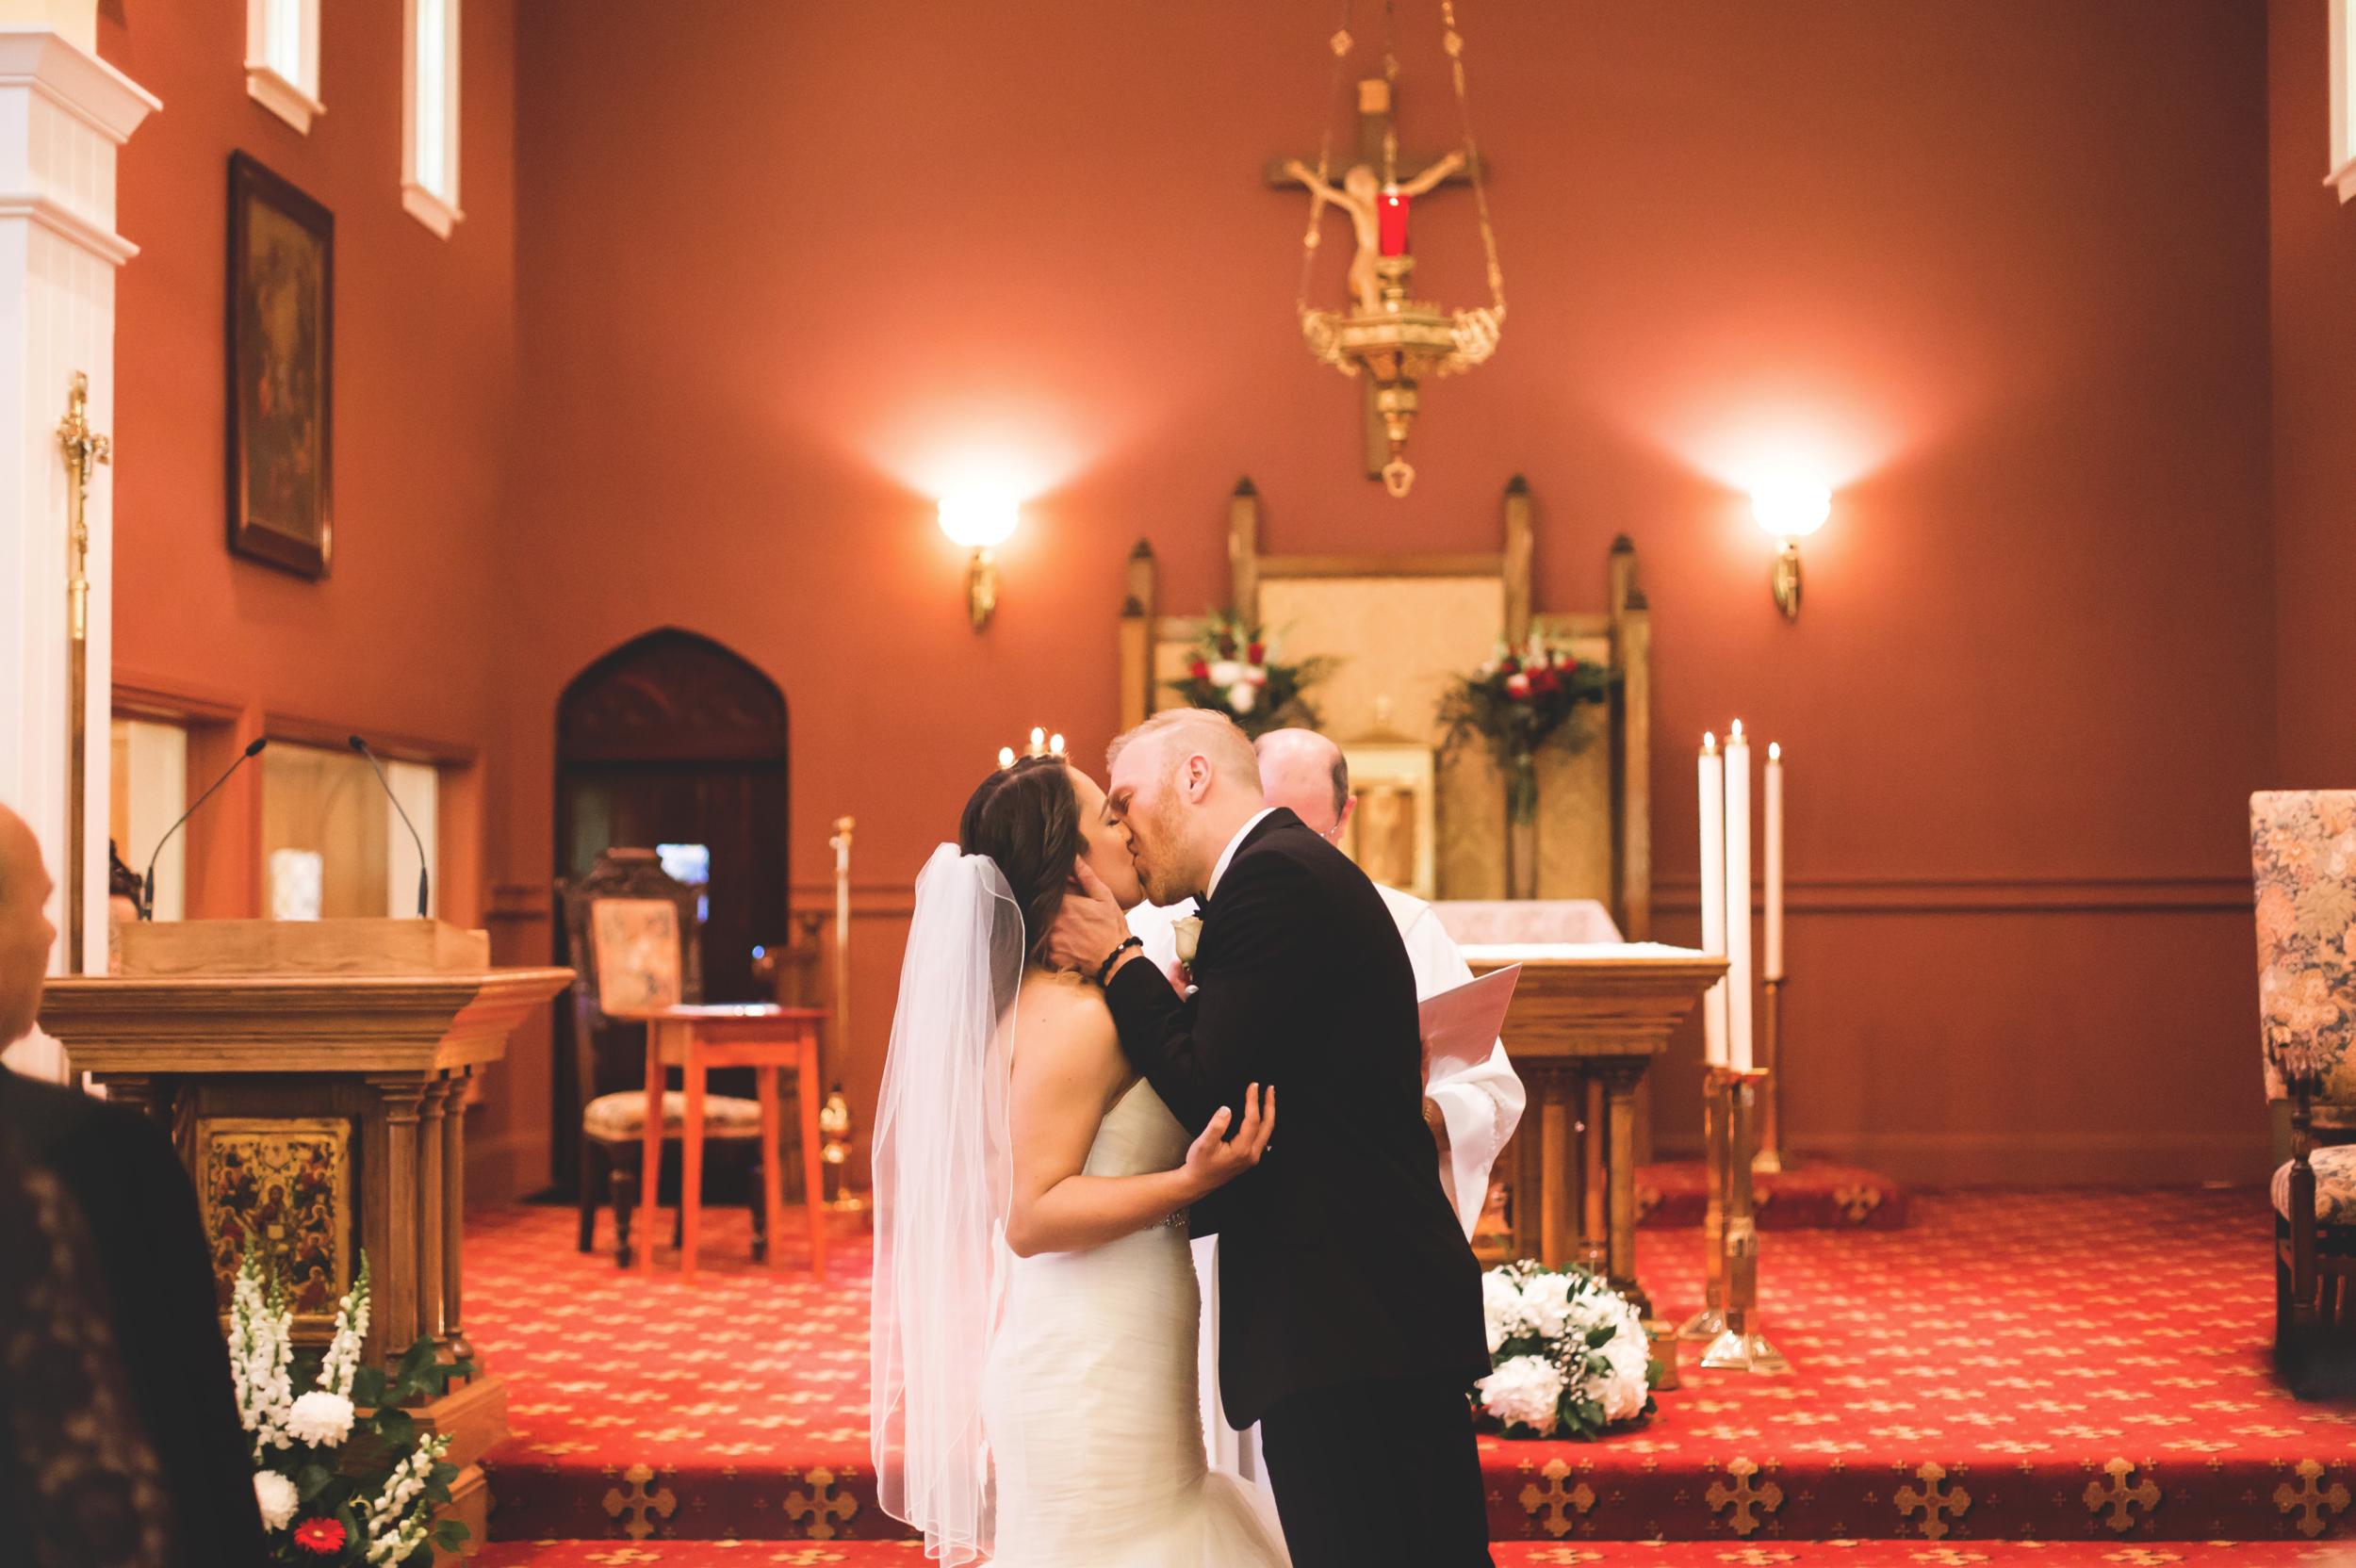 Wedding-Harbour-Banquet-Center-Oakville-Photographer-Wedding-Hamilton-Saint-James-Espresso-Downtown-HamOnt-GTA-Niagara-Toronto-Moments-by-Lauren-Photography-Photo-Image-17.png